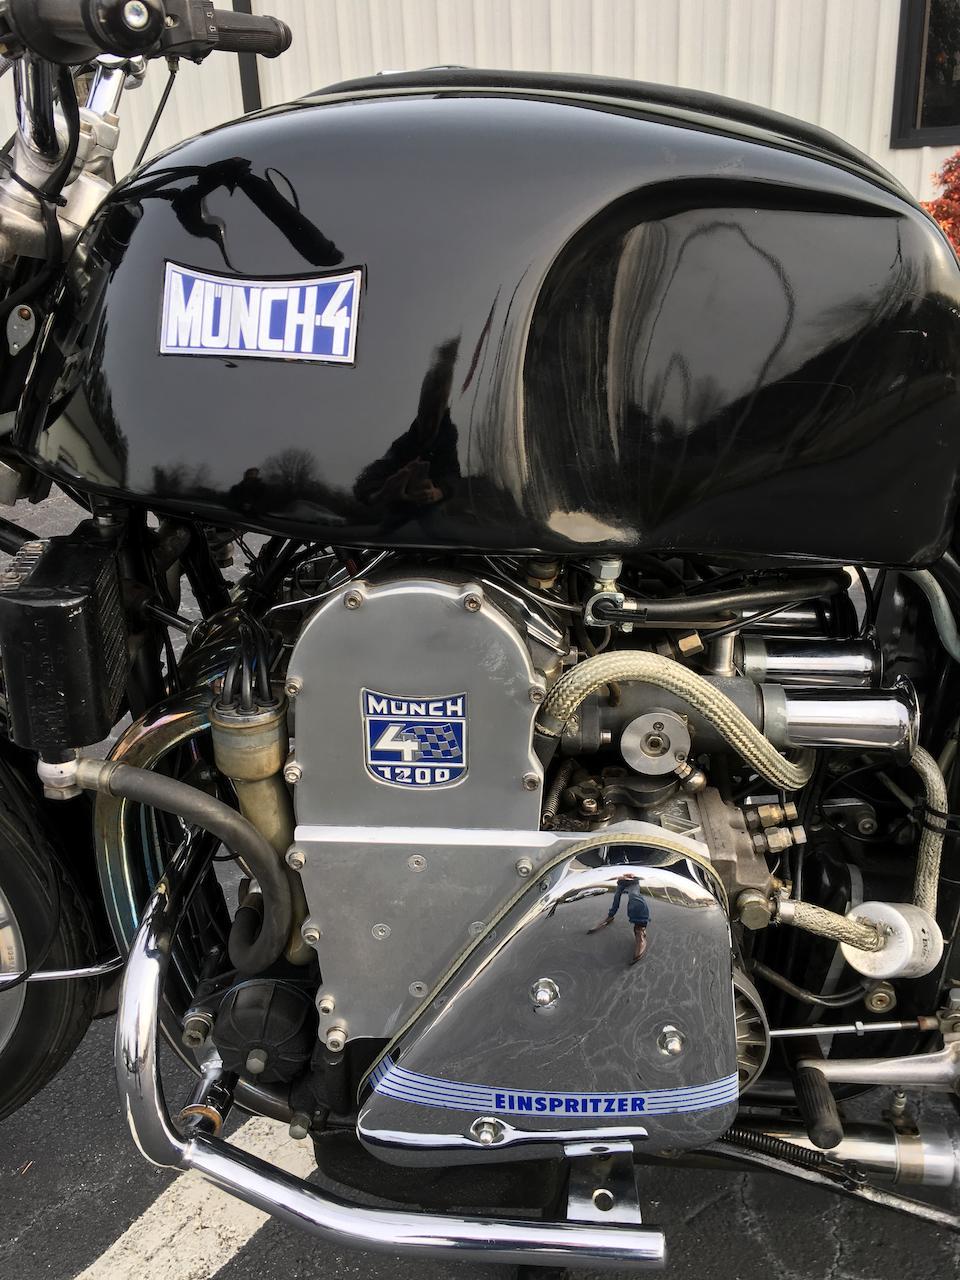 1974 Münch Mammoth TTS-E 1200  Frame no. 405X246 Engine no. 405X246